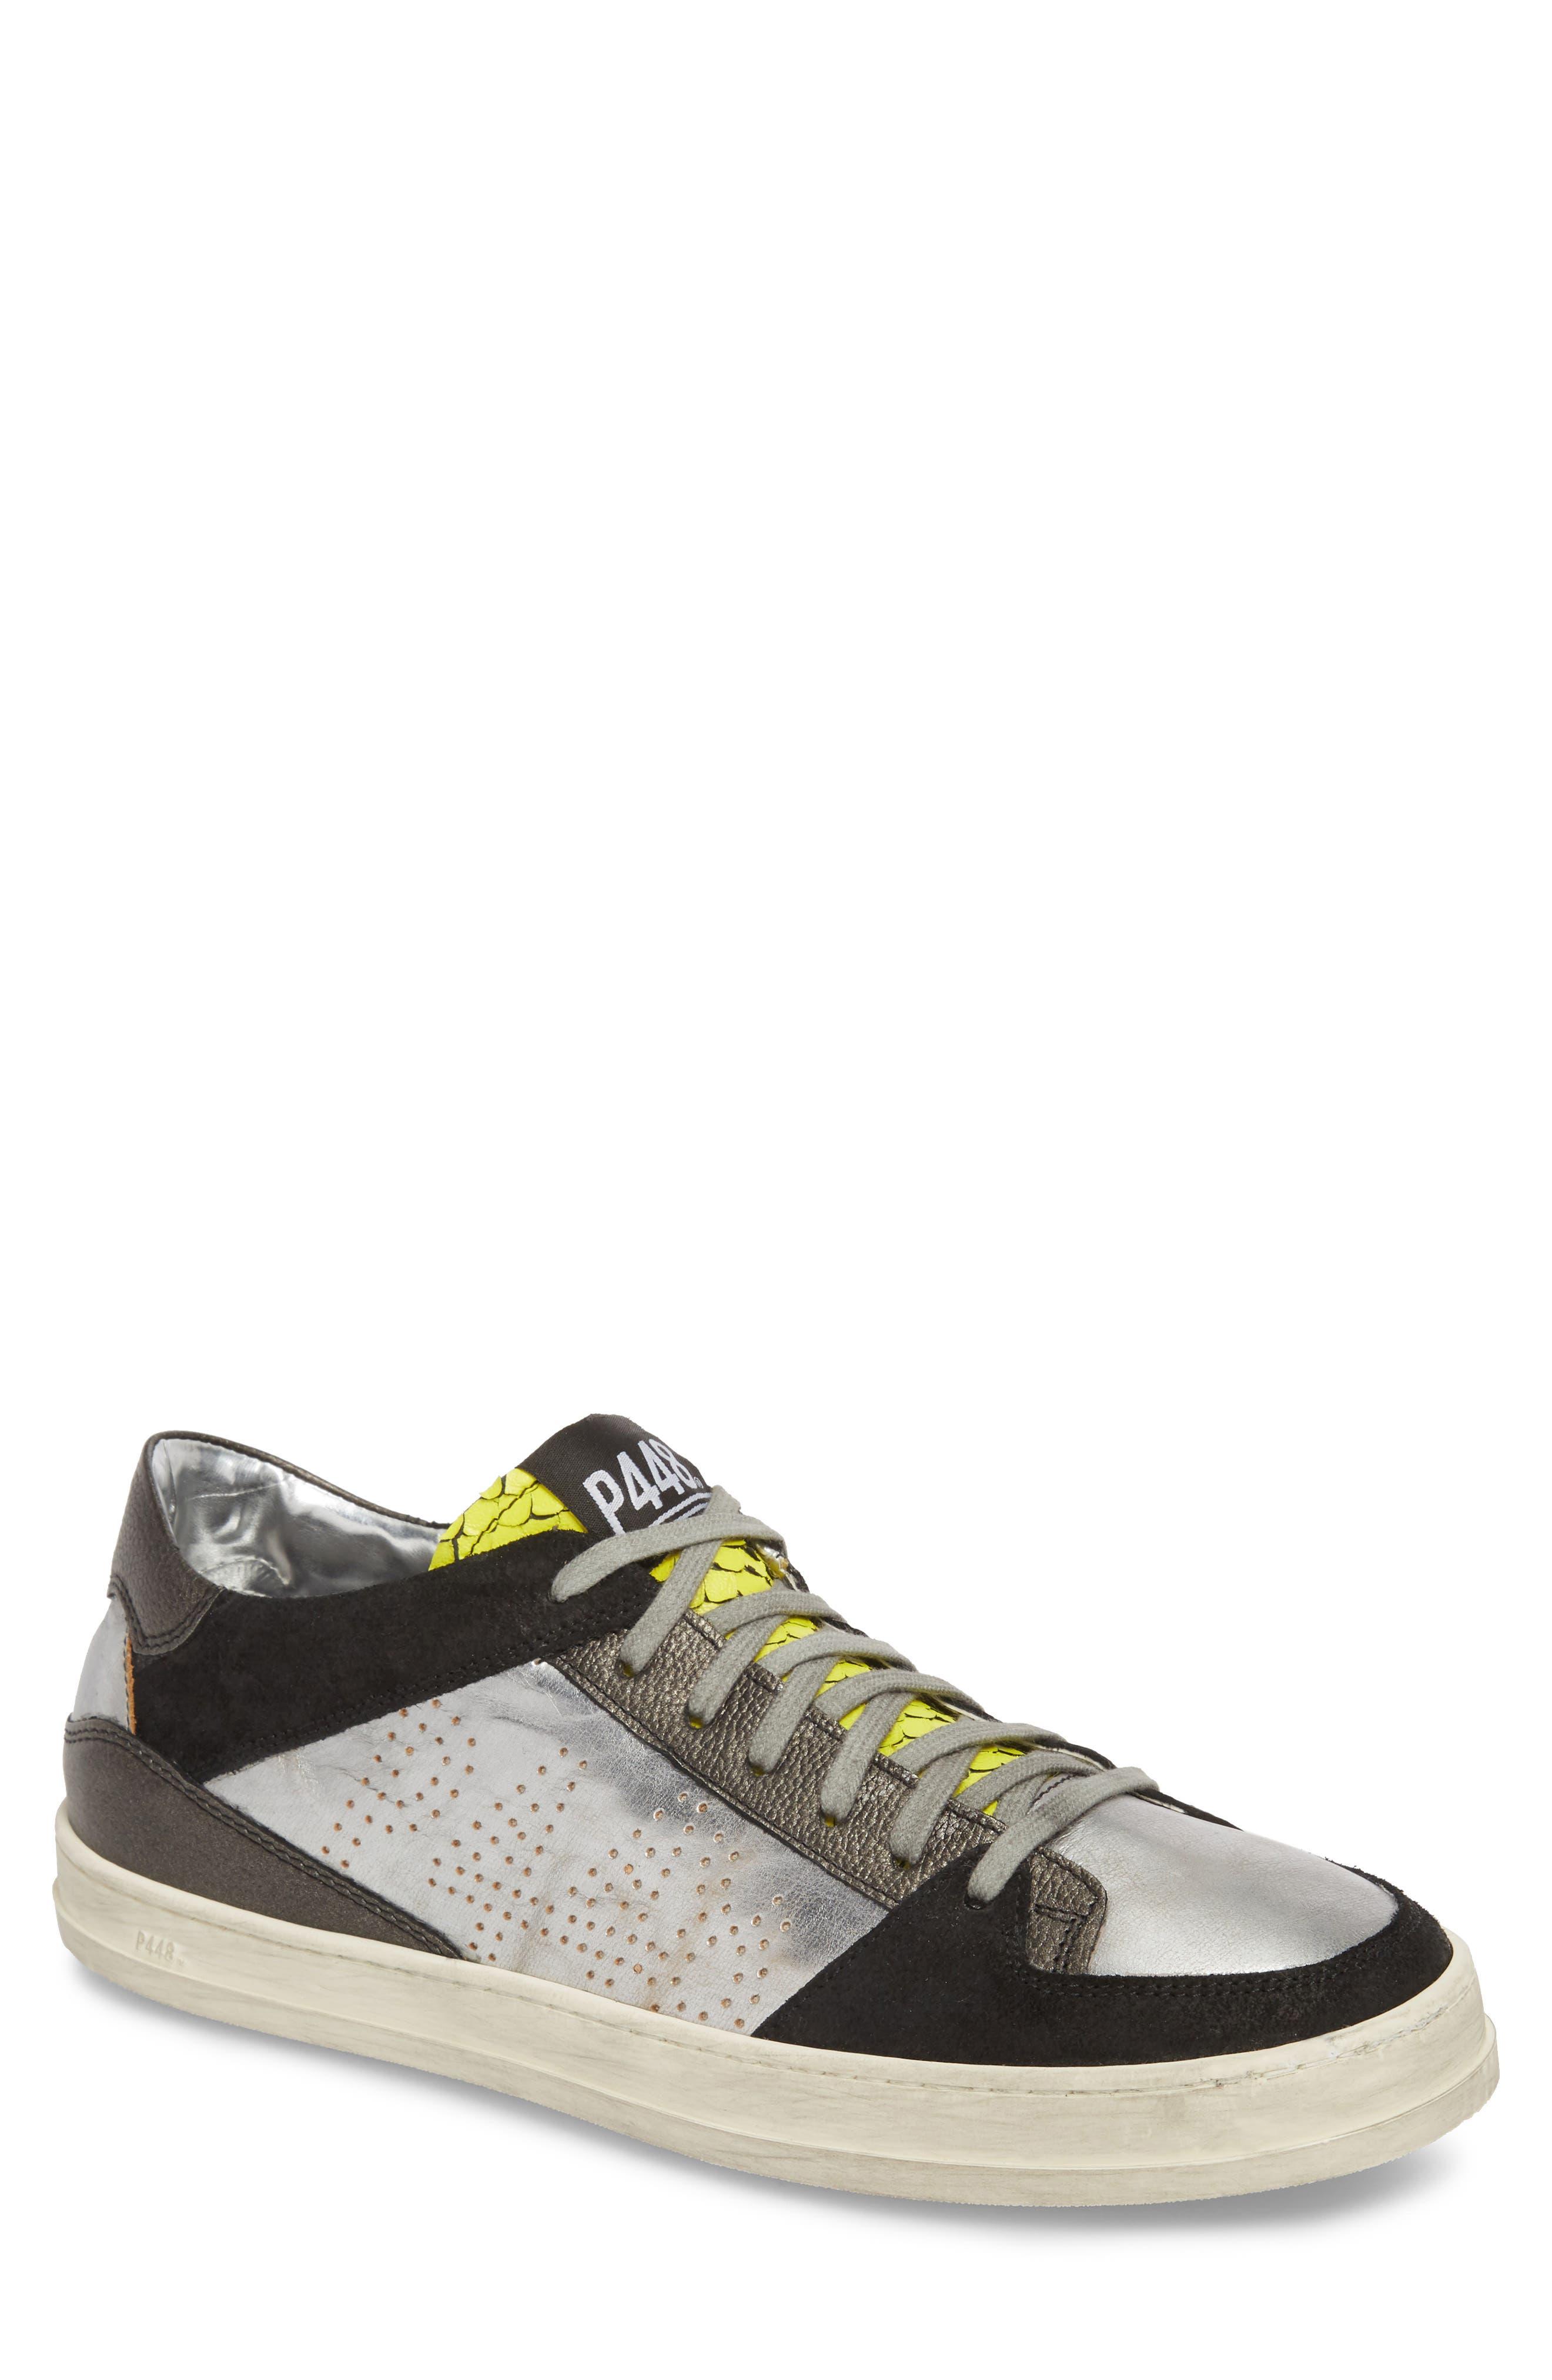 Alternate Image 1 Selected - P448 Queens Mesh Low Top Sneaker (Men)